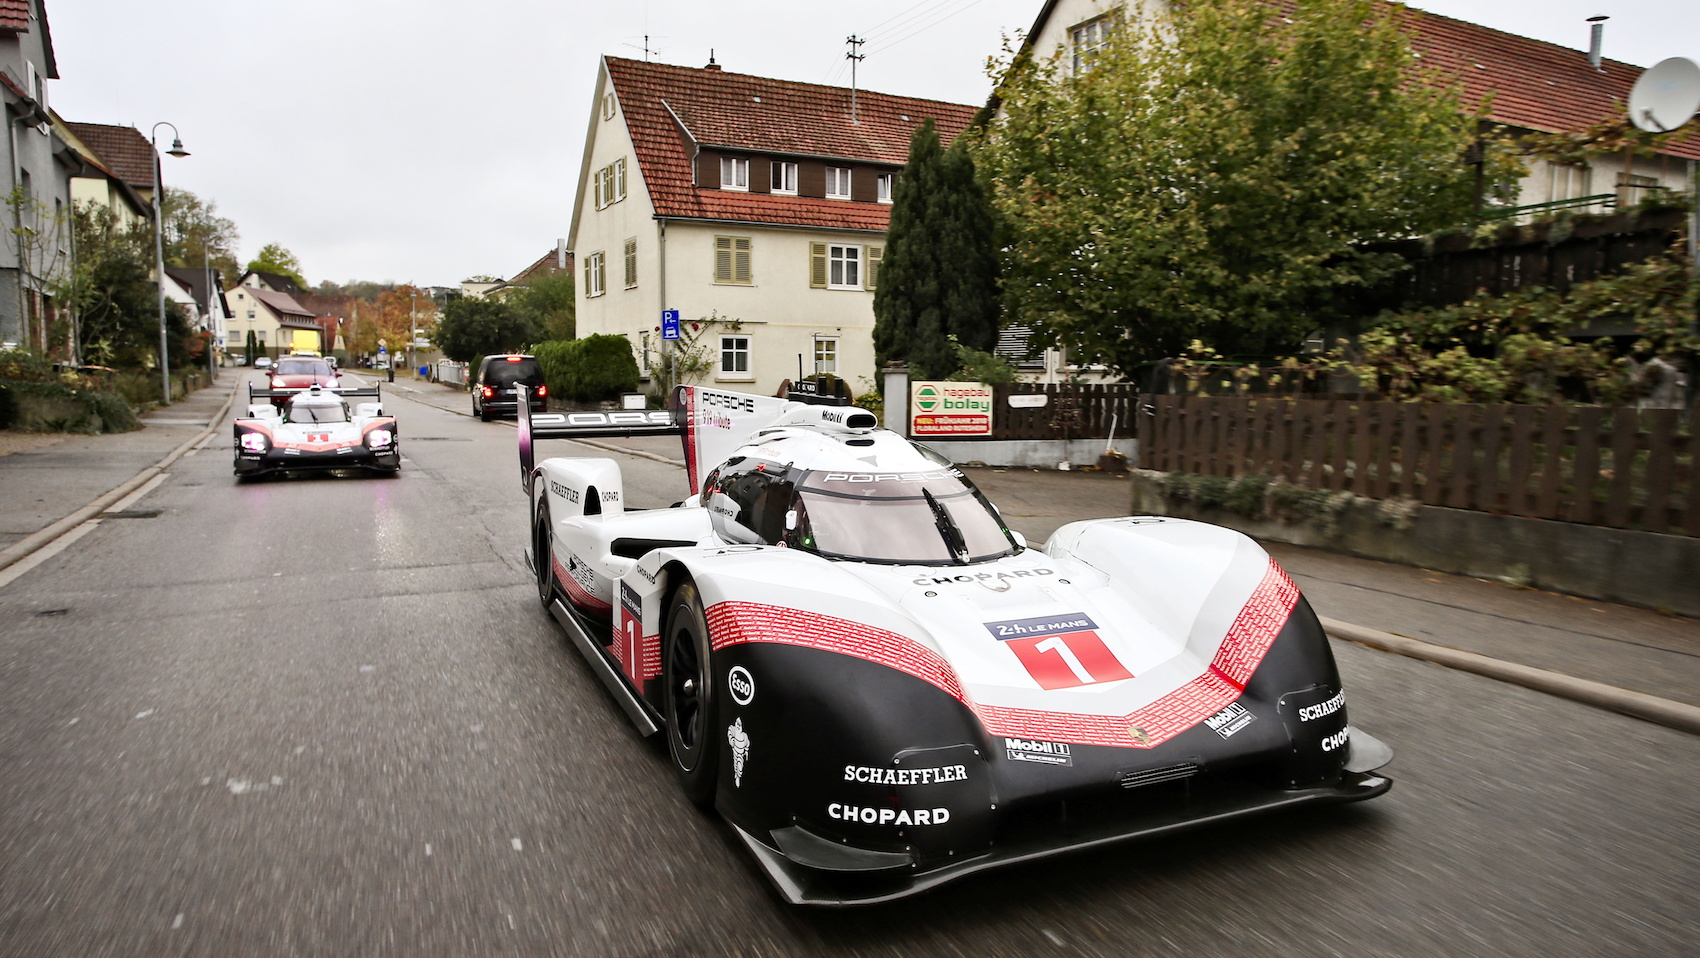 Porsche 919, Racingline, racinglinehu, racingline.hu